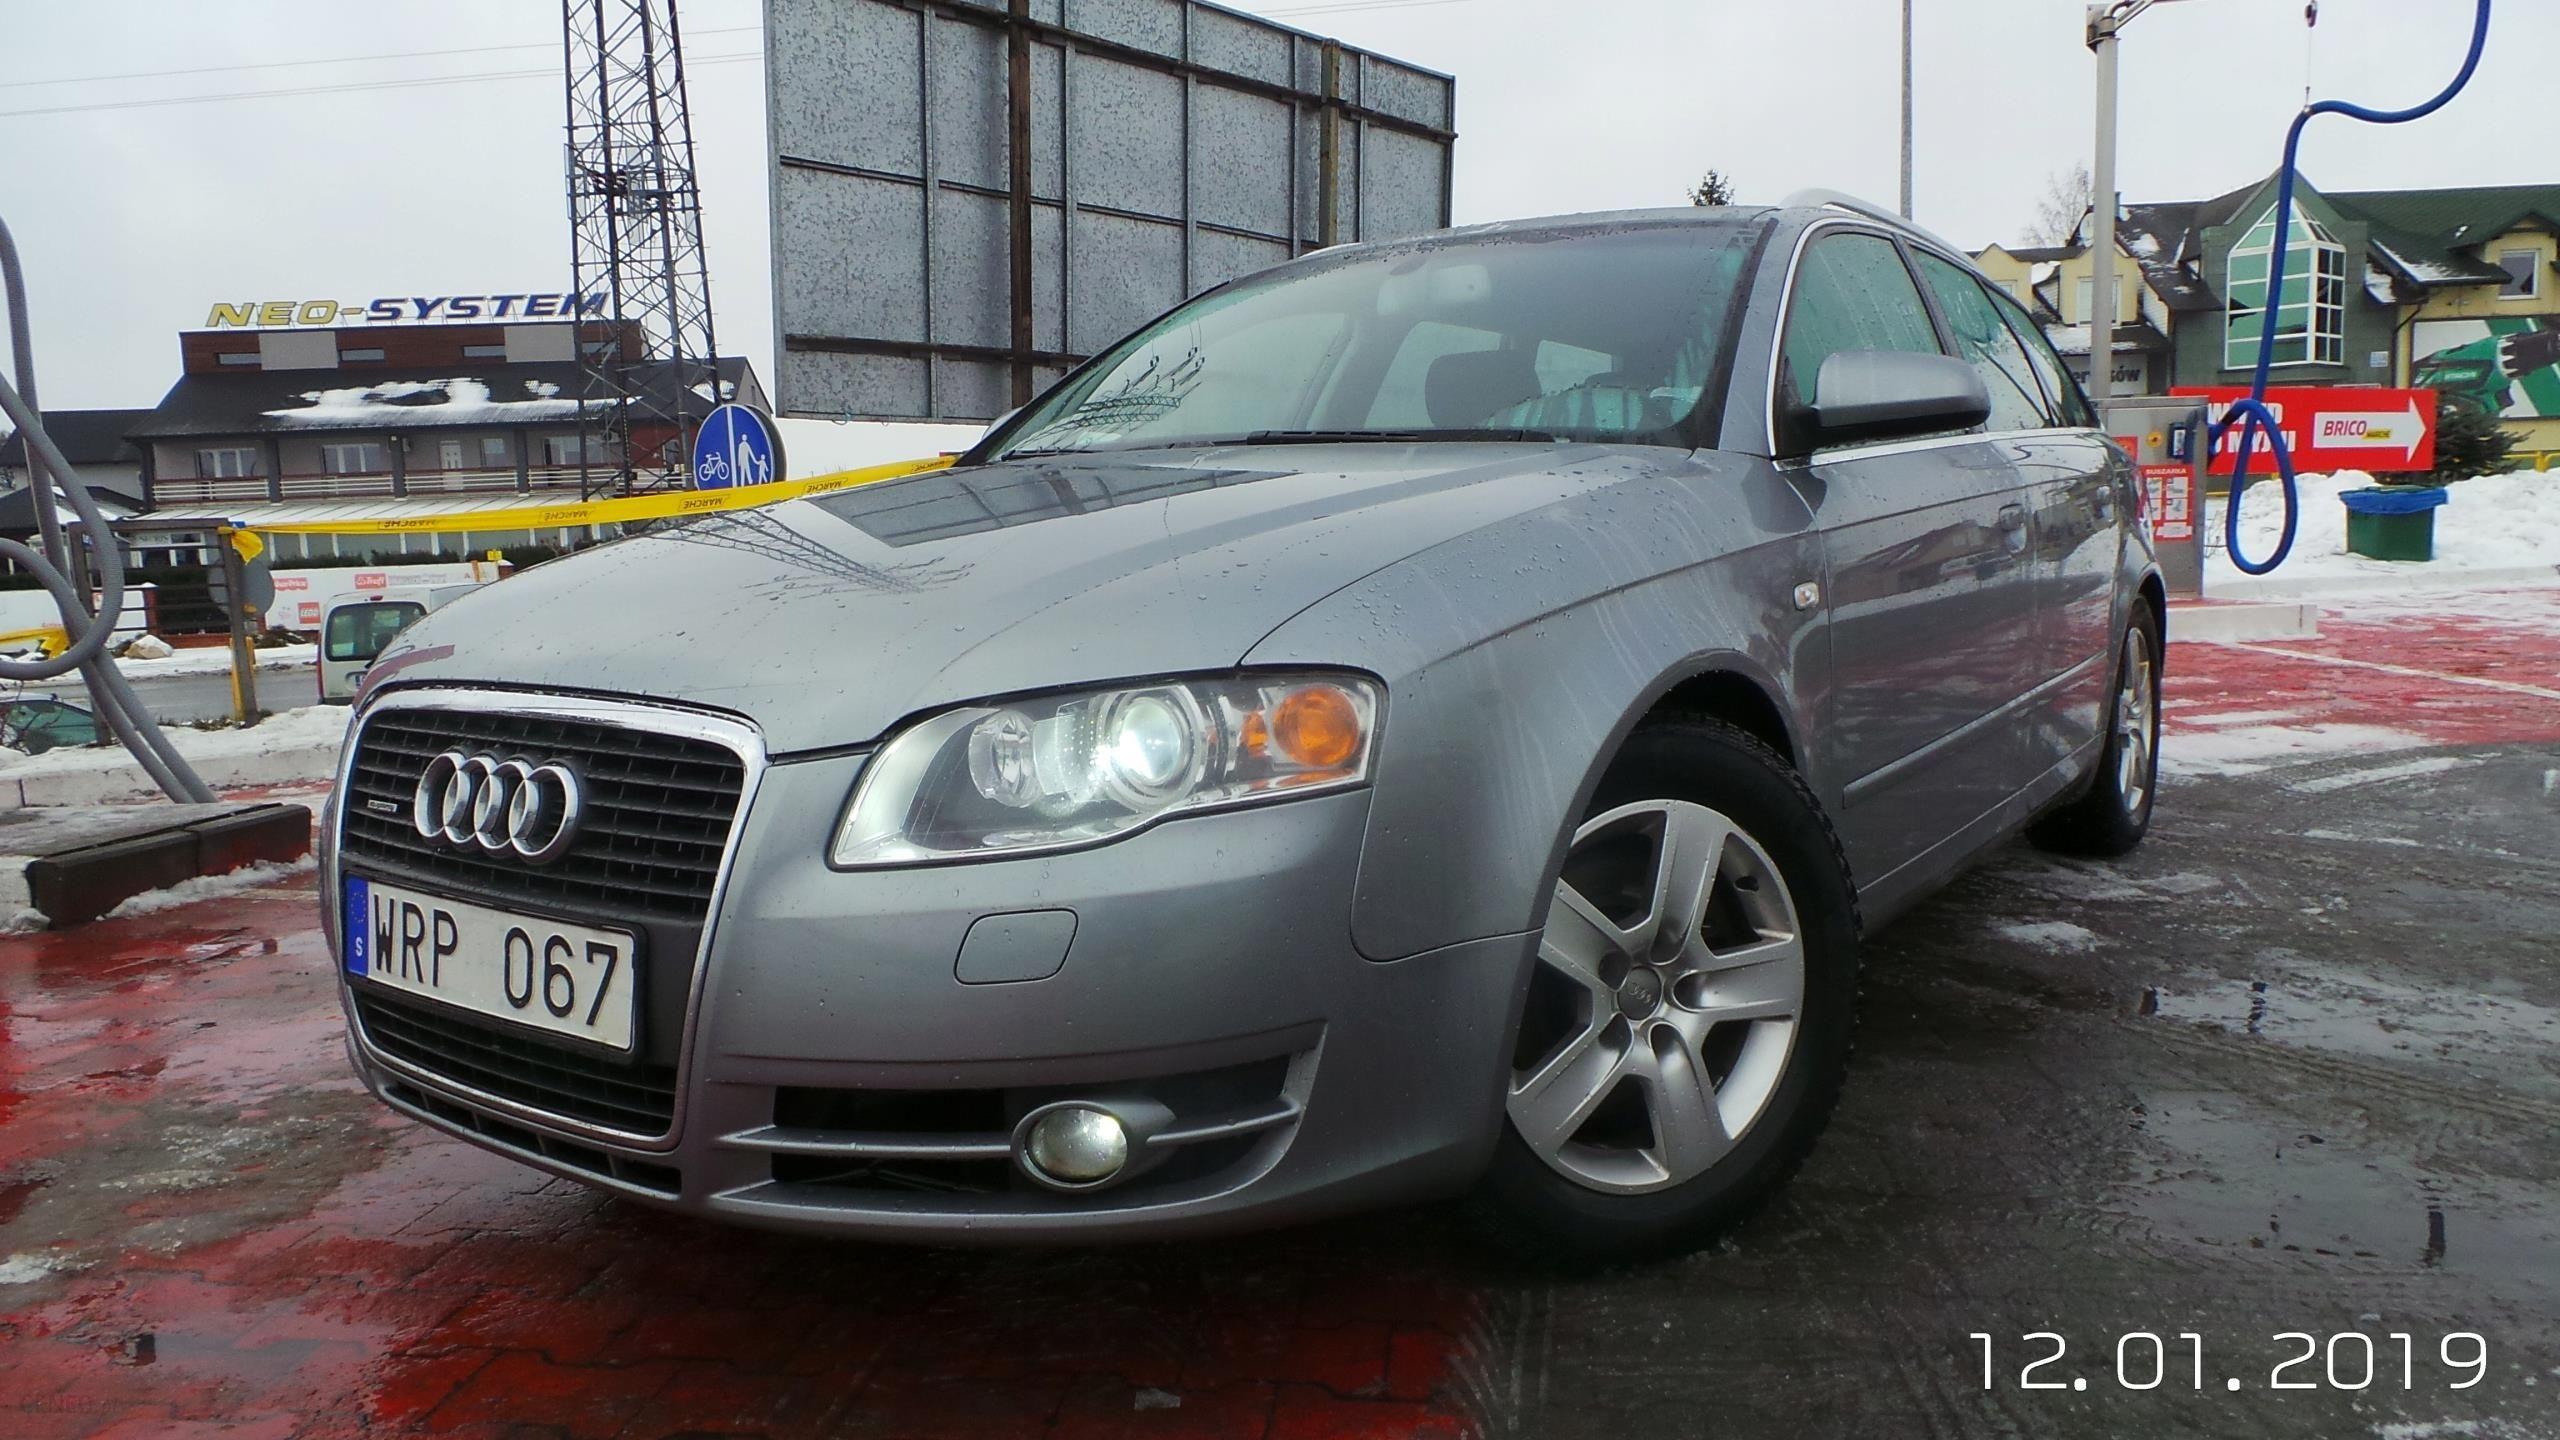 Audi A4 B7 18t 163km Bixenon4x4 Qattrotempomat Opinie I Ceny Na